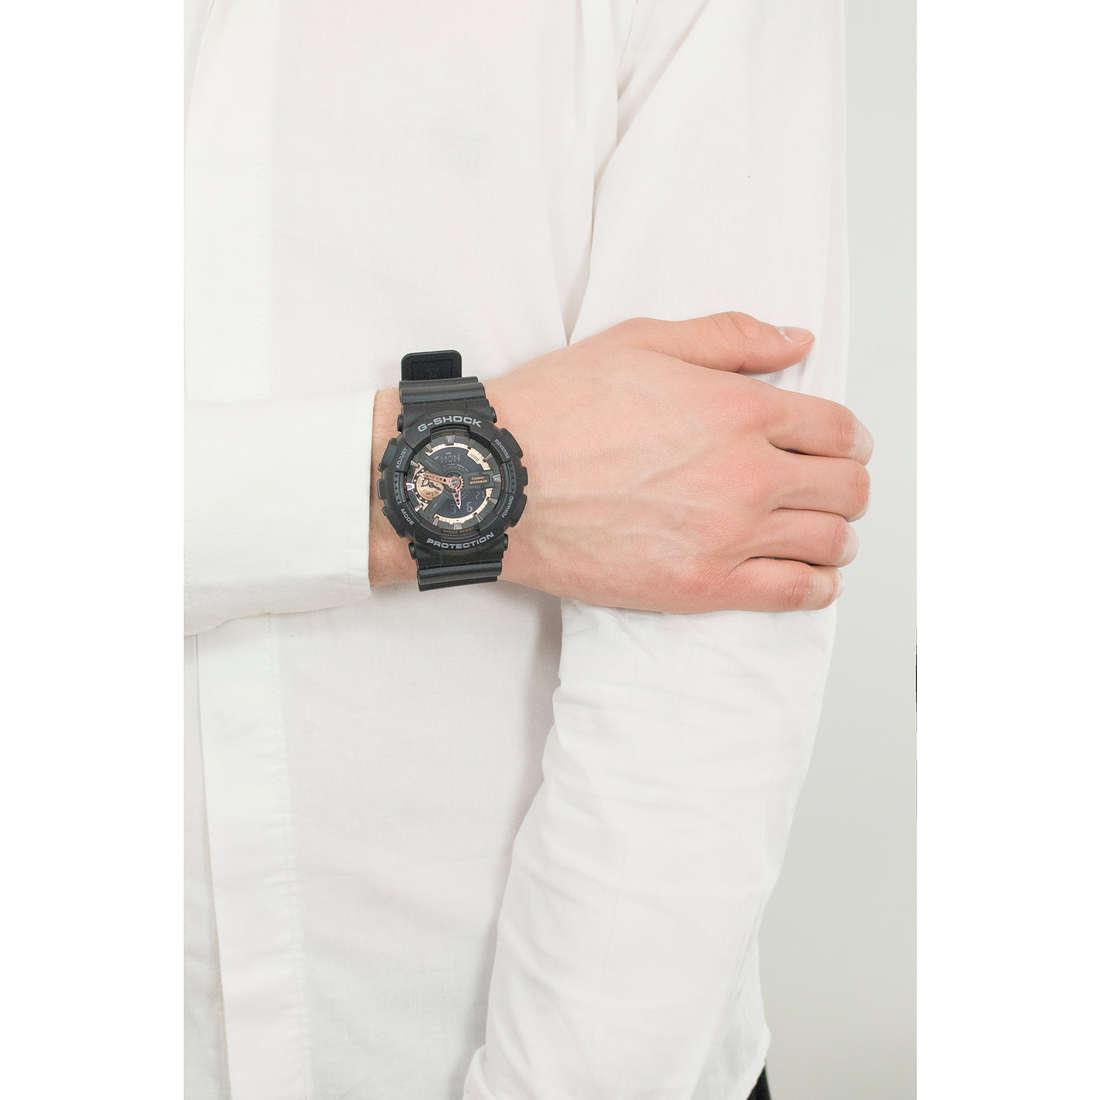 Casio digitali G-Shock uomo GA-110RG-1AER indosso